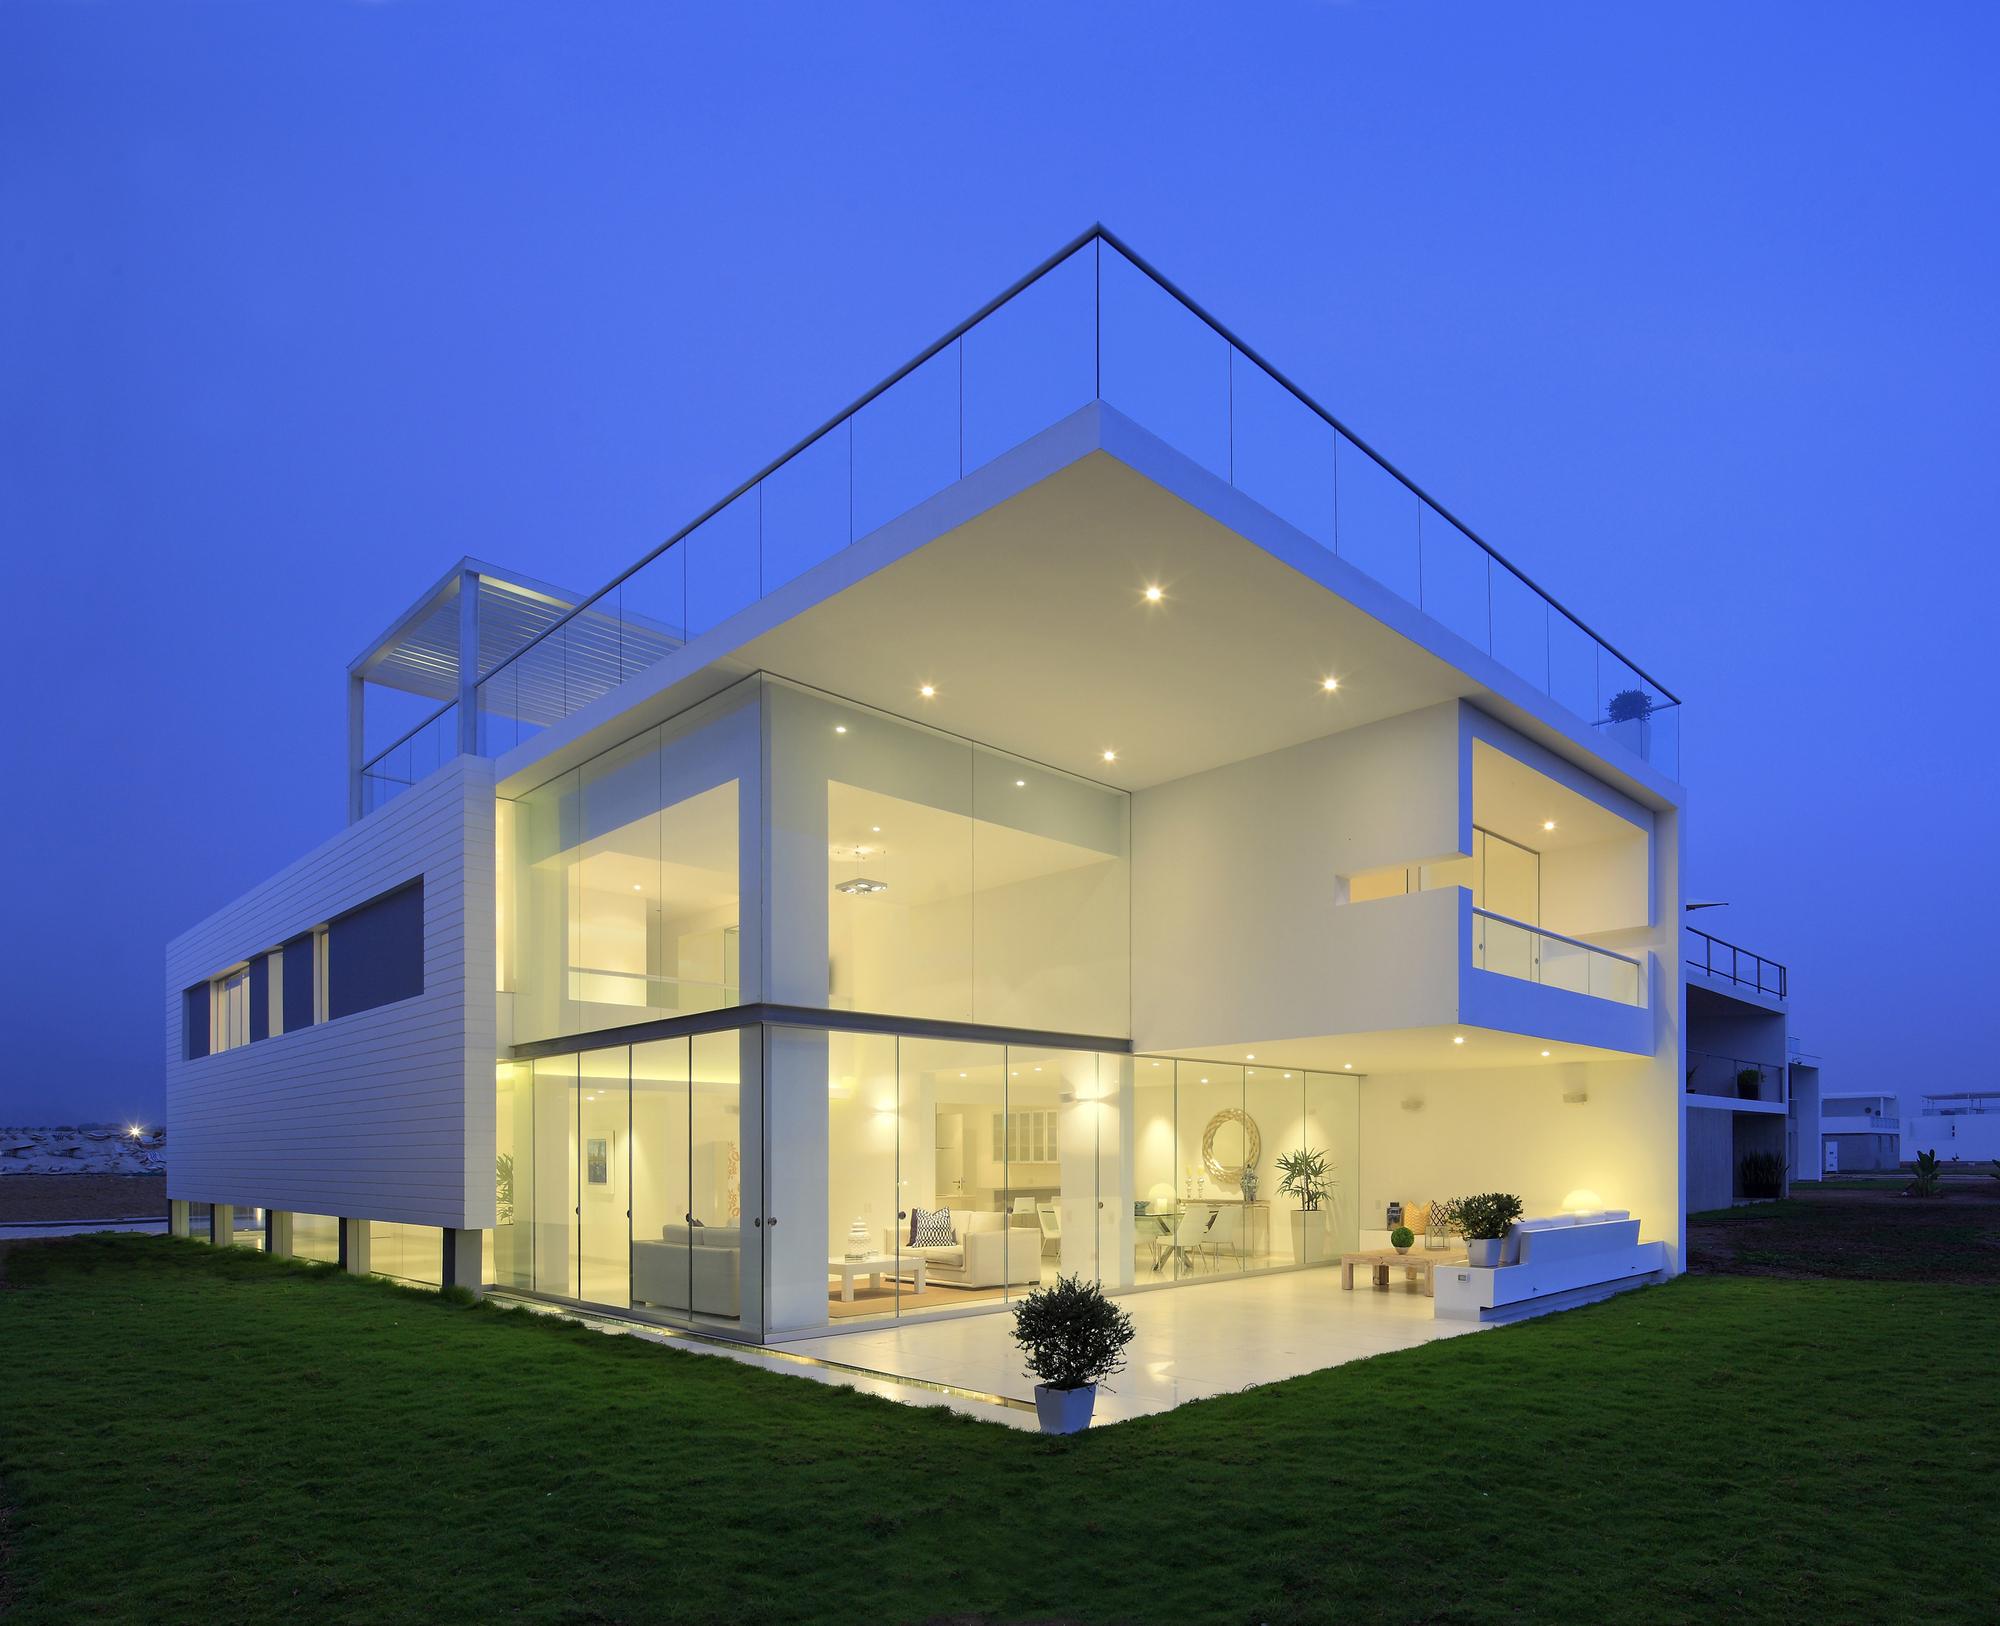 Galeria de casa mb rubio arquitectos 21 for Casa de arquitectos